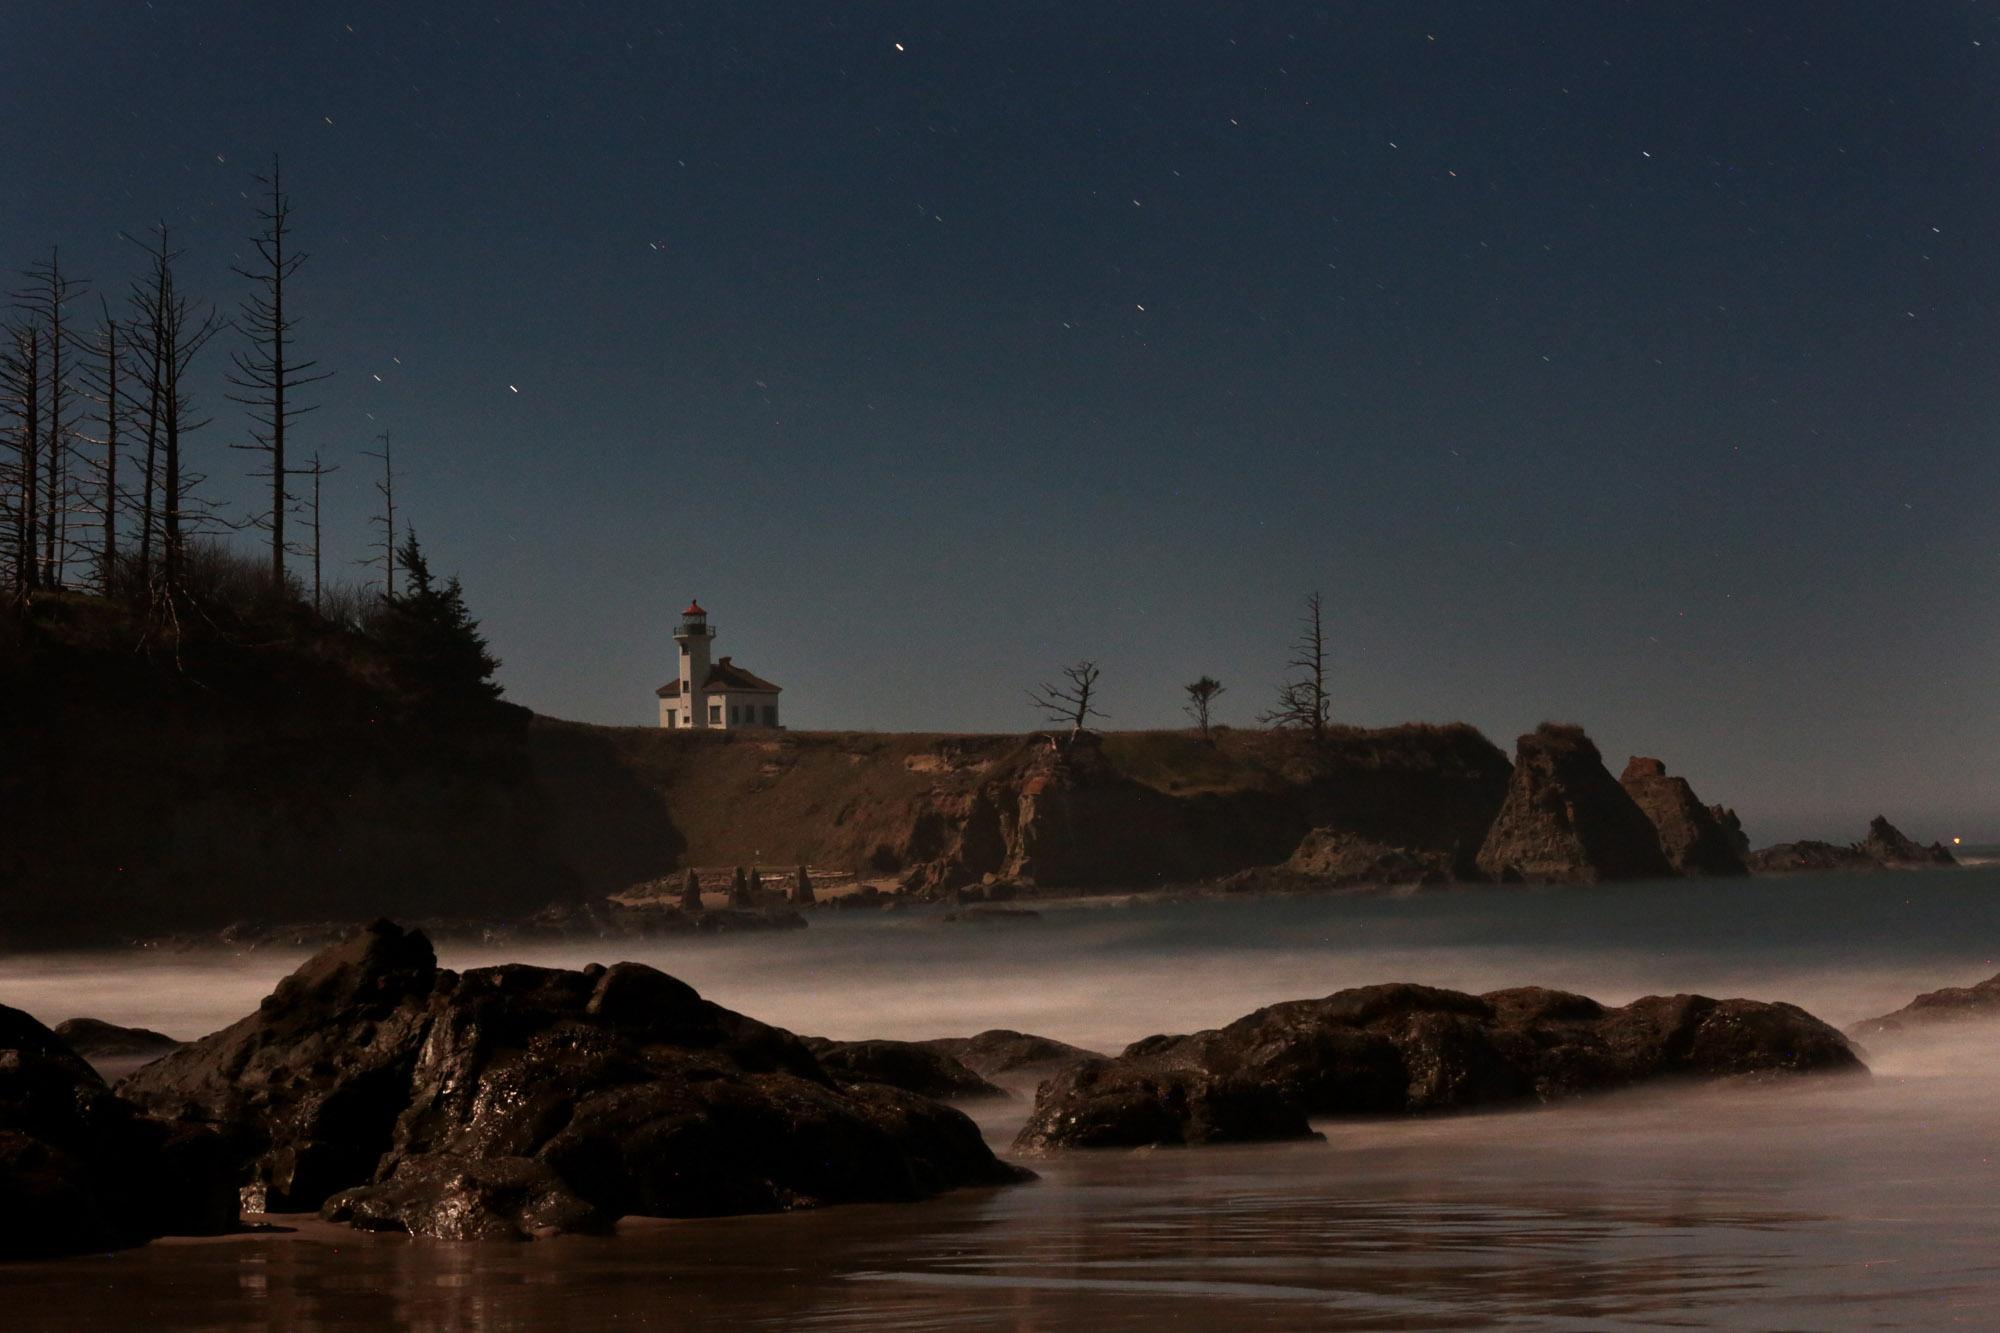 140116.aam.lighthousebeach_0010_EDIT.jpg